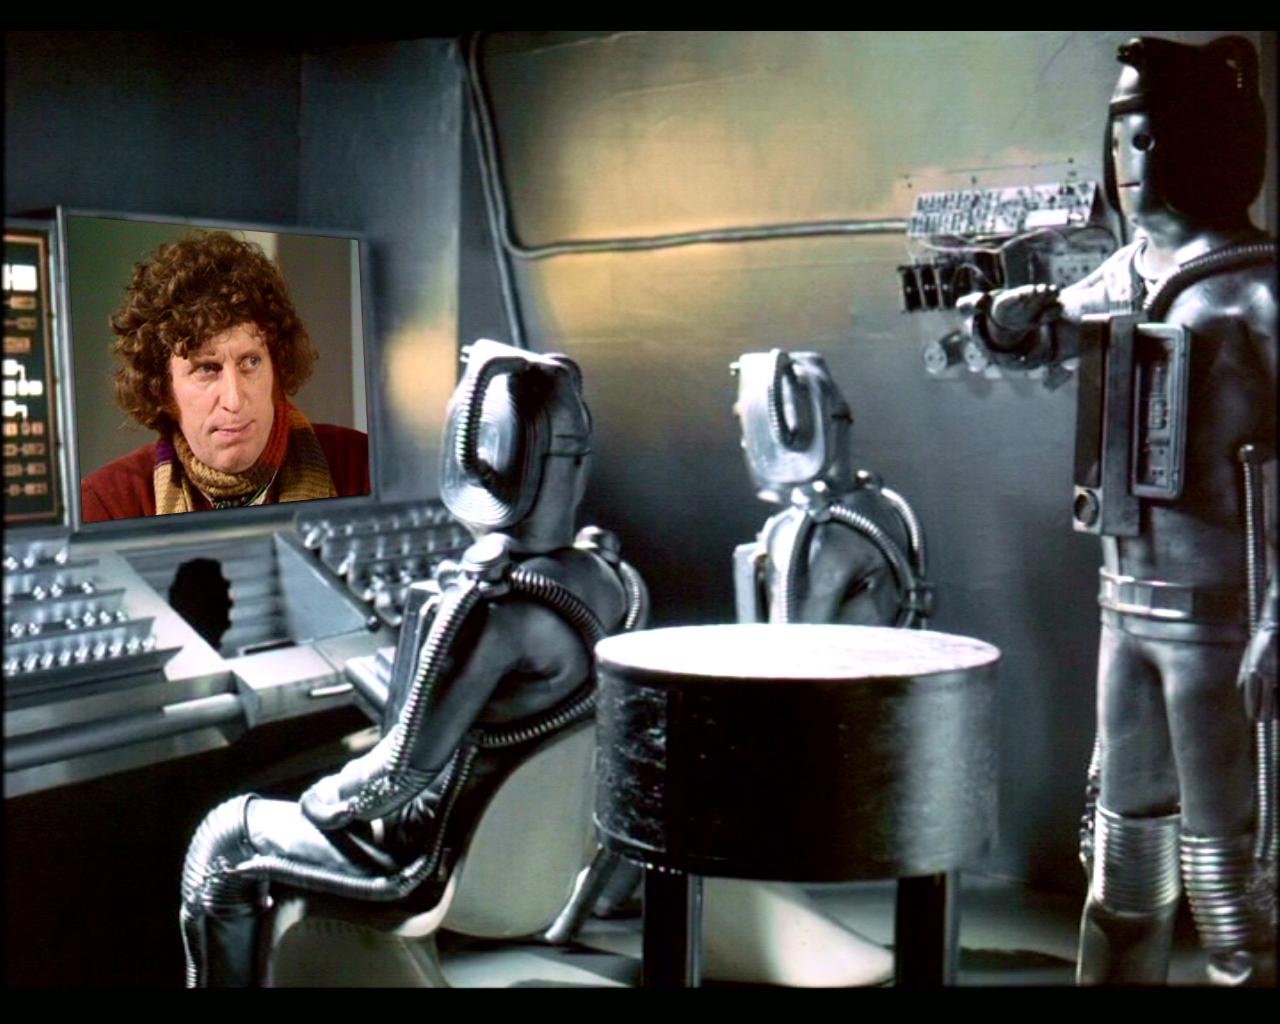 http://3.bp.blogspot.com/-bSXxyFk3DQI/ThB8zjoNhlI/AAAAAAAABh0/oyY3TDqGpyY/s1600/revenge-of-the-cybermen-doctor-who.jpg